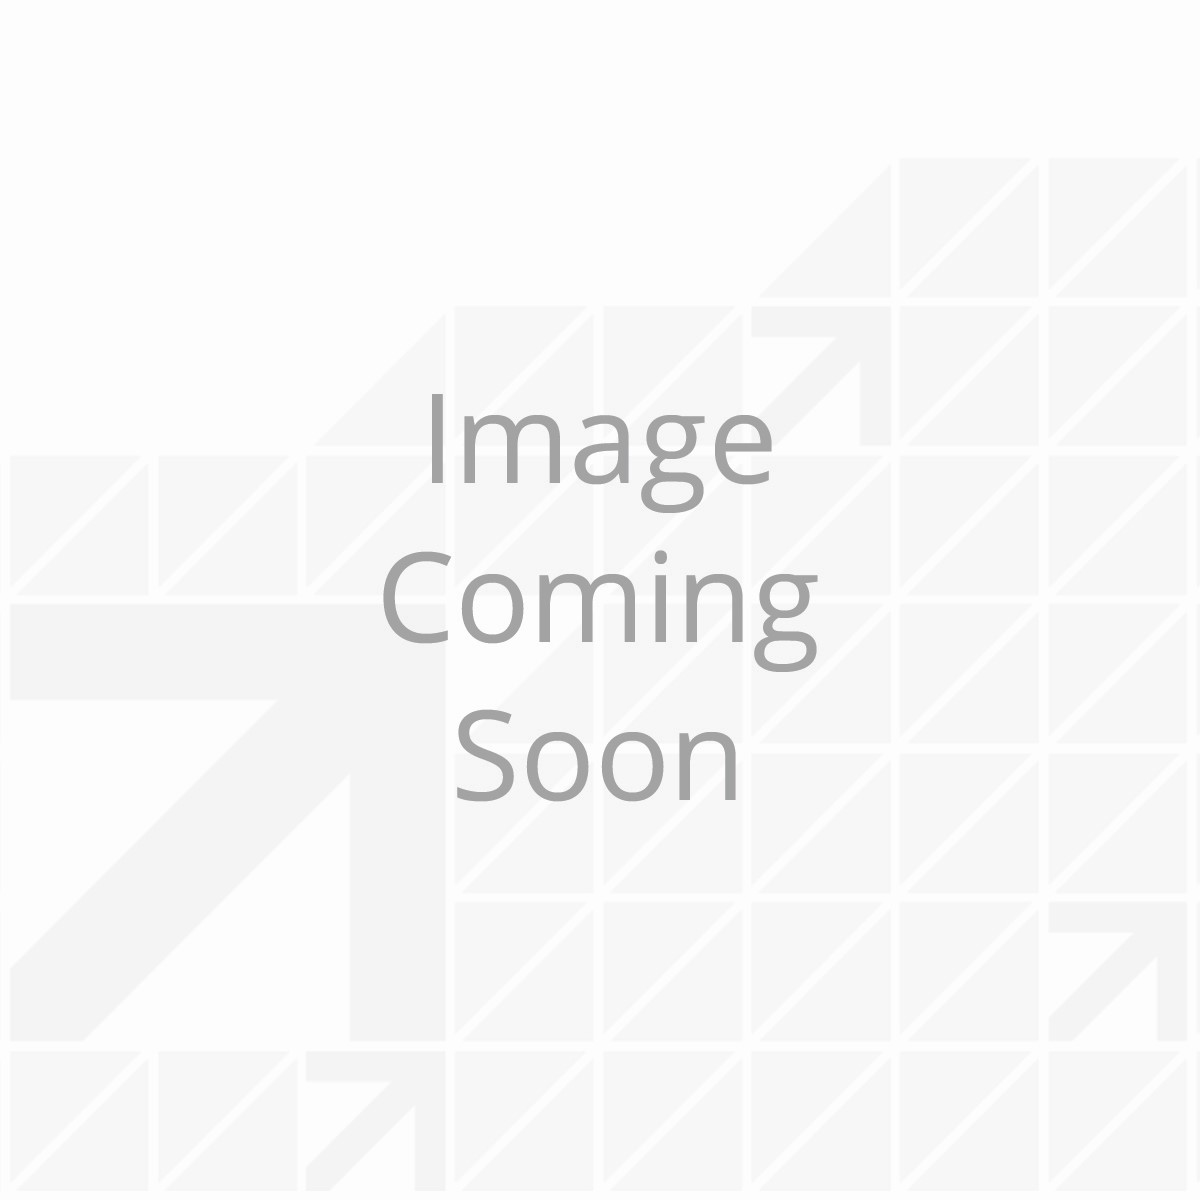 FT-CG9 Chevy/GMC Tiedown Set